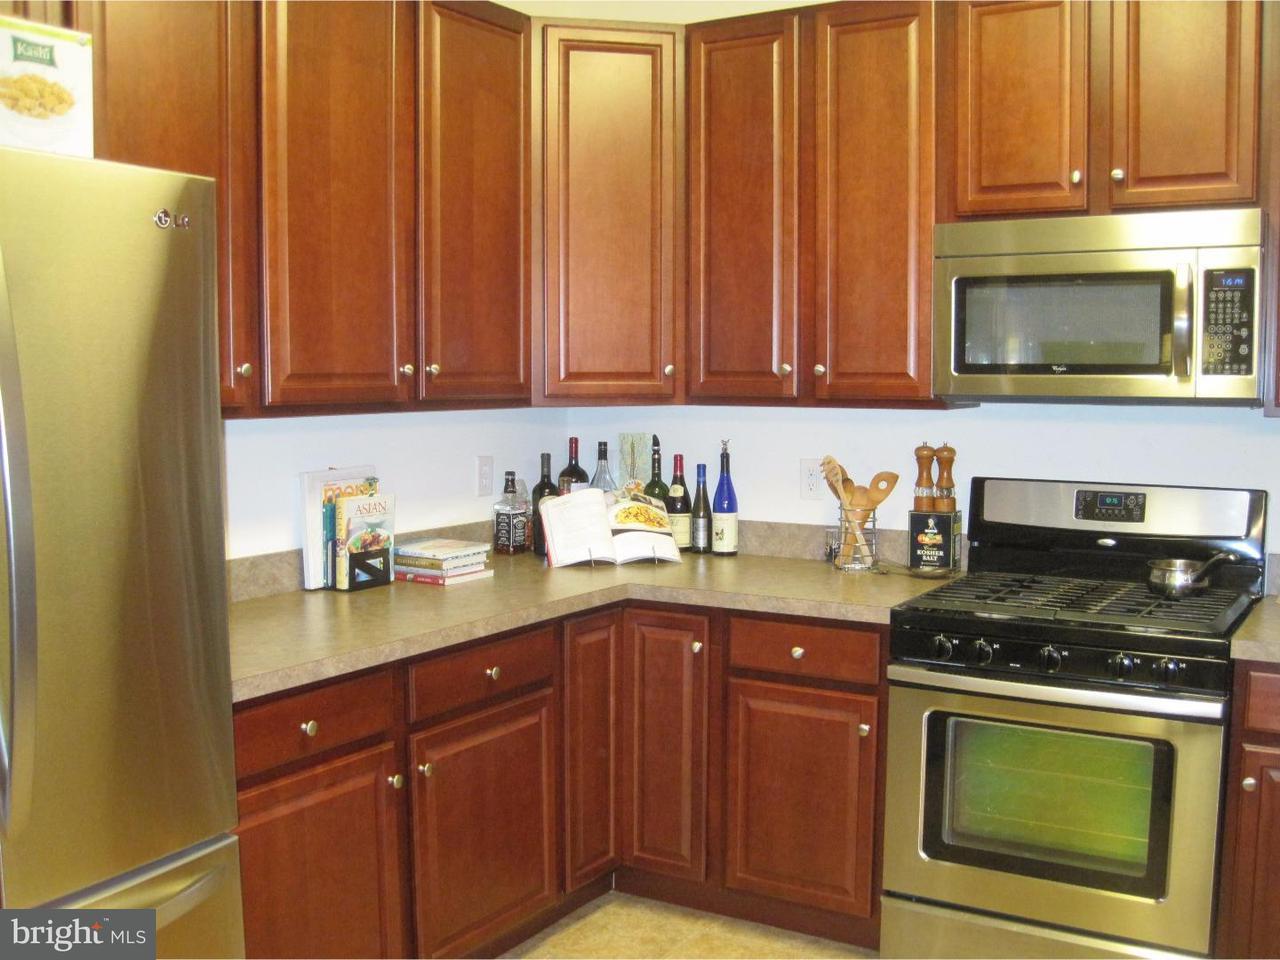 Condominium for Rent at 1026 TIMBERLAKE Drive Ewing, New Jersey 08830 United StatesMunicipality: Ewing Township